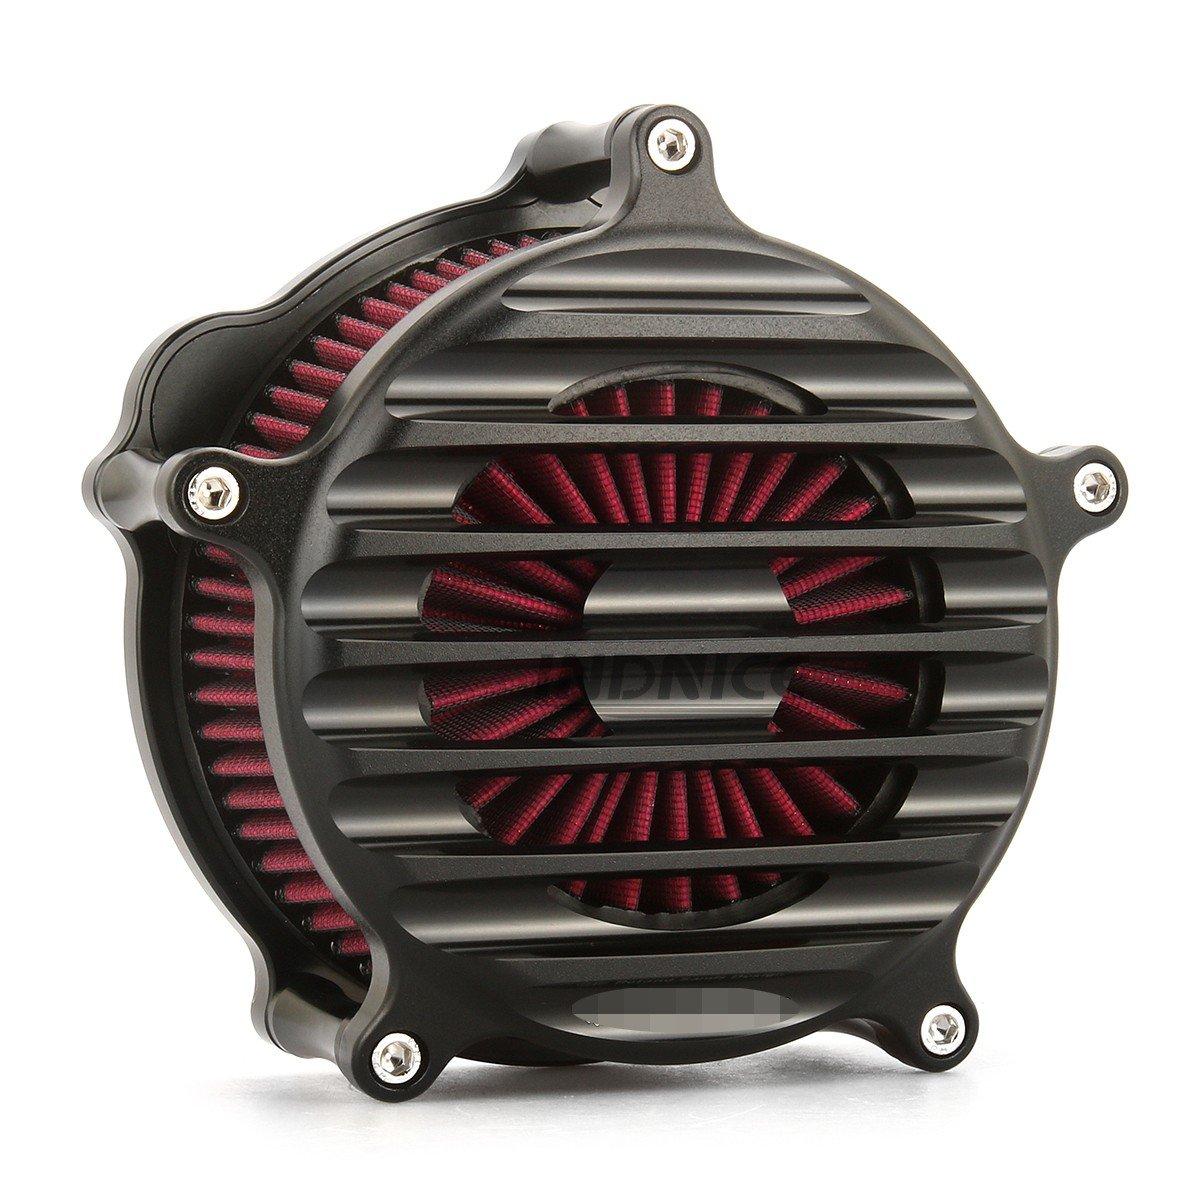 CNC Black RSD Nostalgia Venturi Air Cleaner for harley sportster xl883 1200 air filters sportster 883 1991-2018   B07DDC3R71